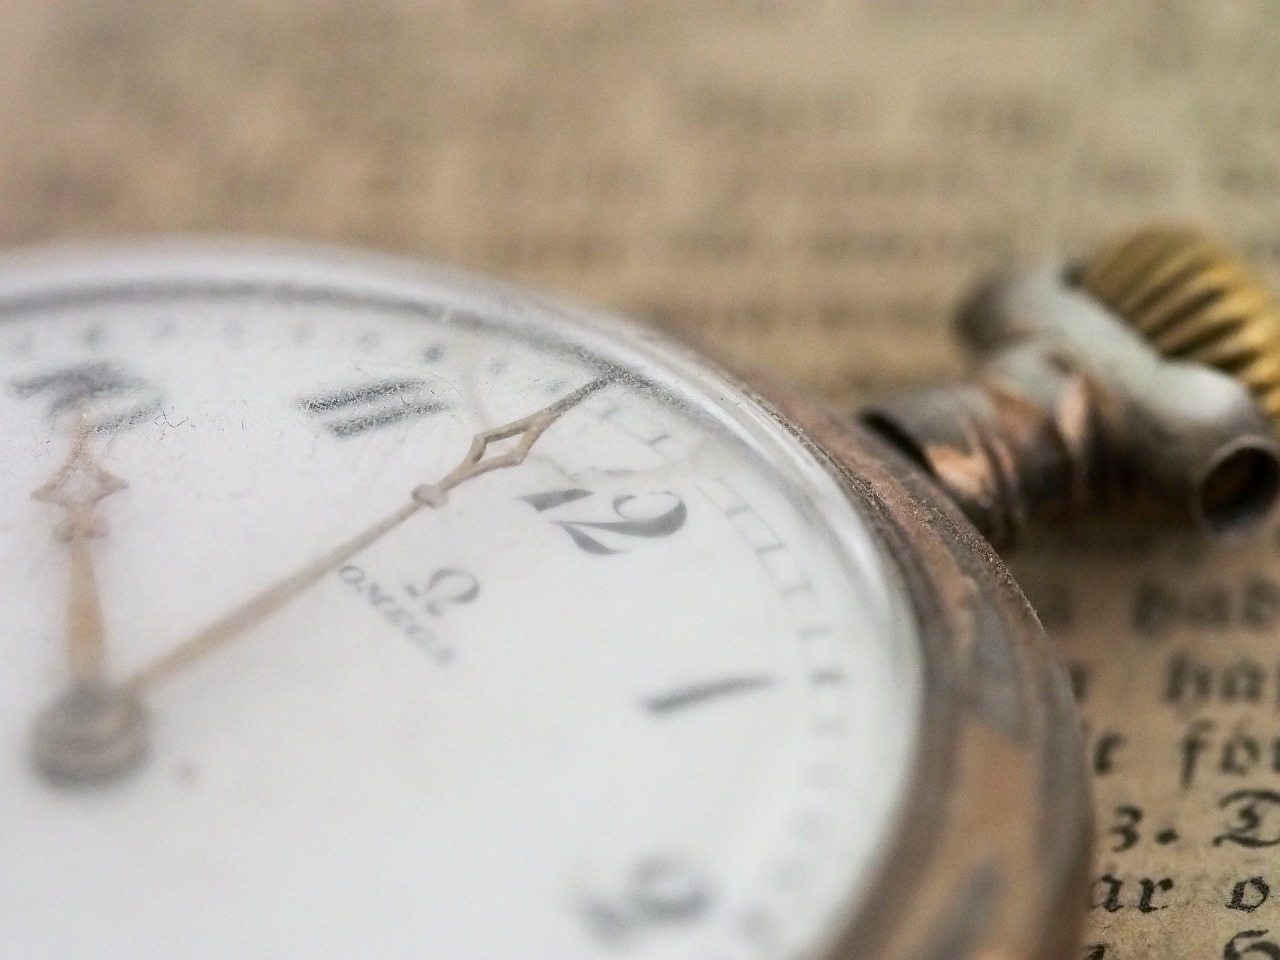 pocket-watch-731301_1920